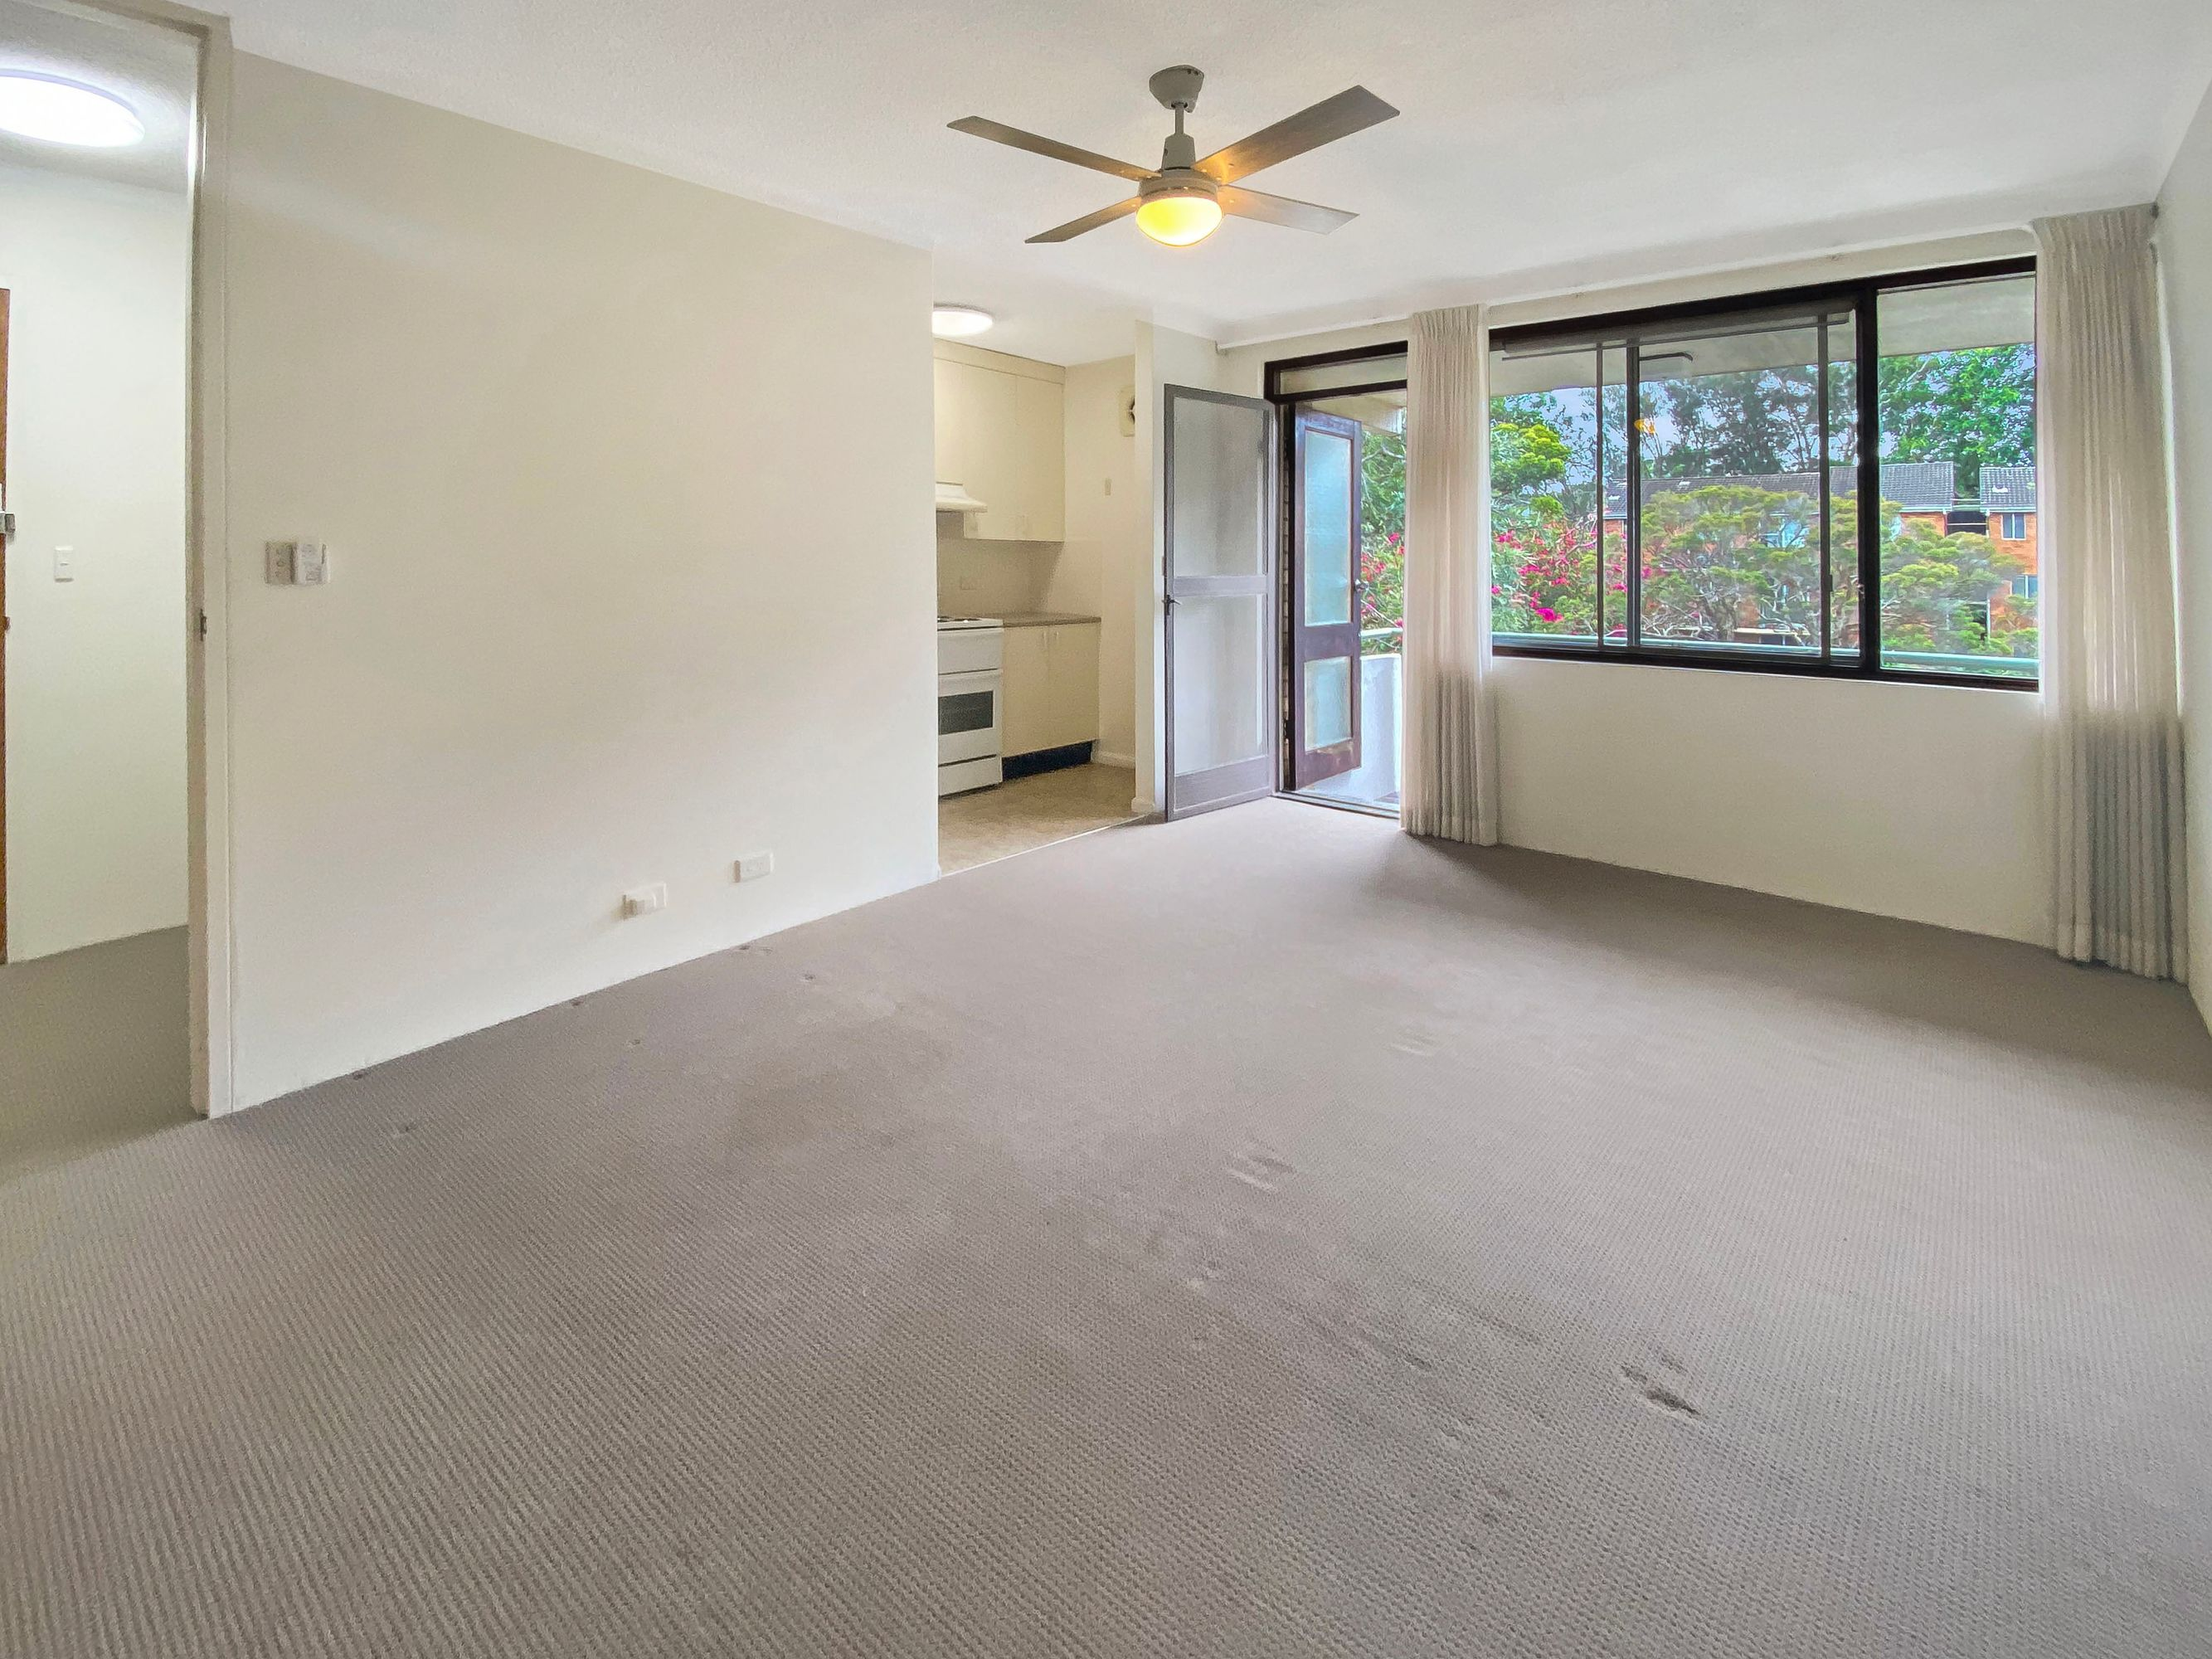 19/52 Meadow Crescent, Meadowbank, NSW 2114